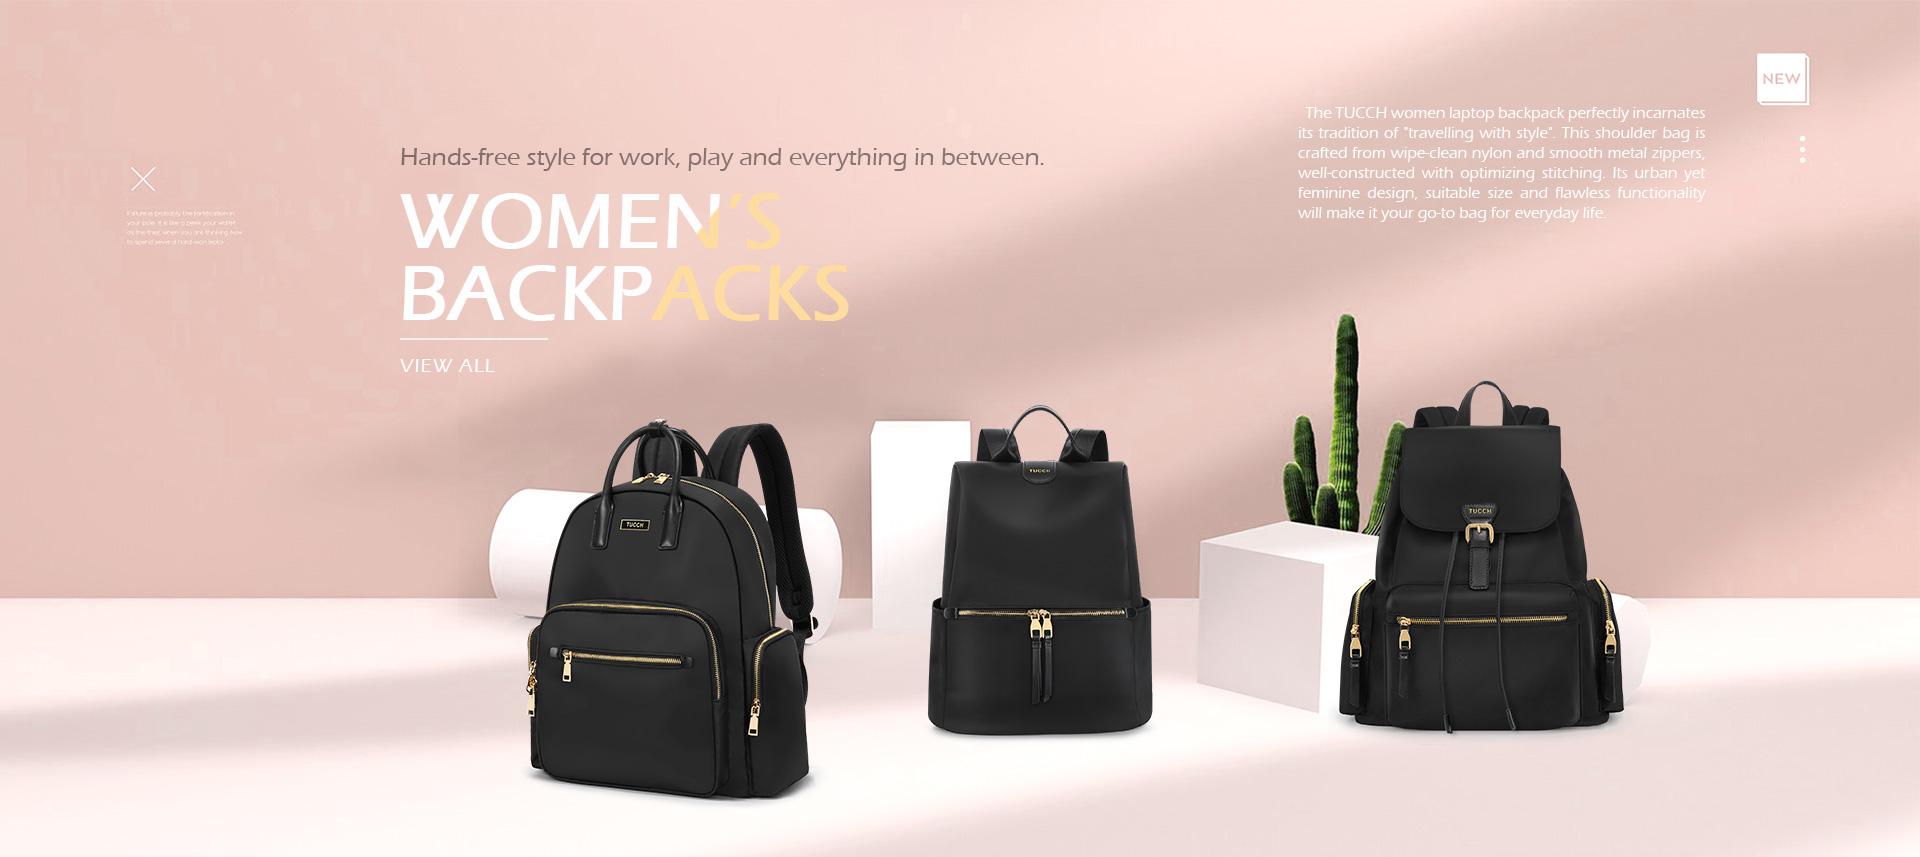 TUCCH Casual Women Bag